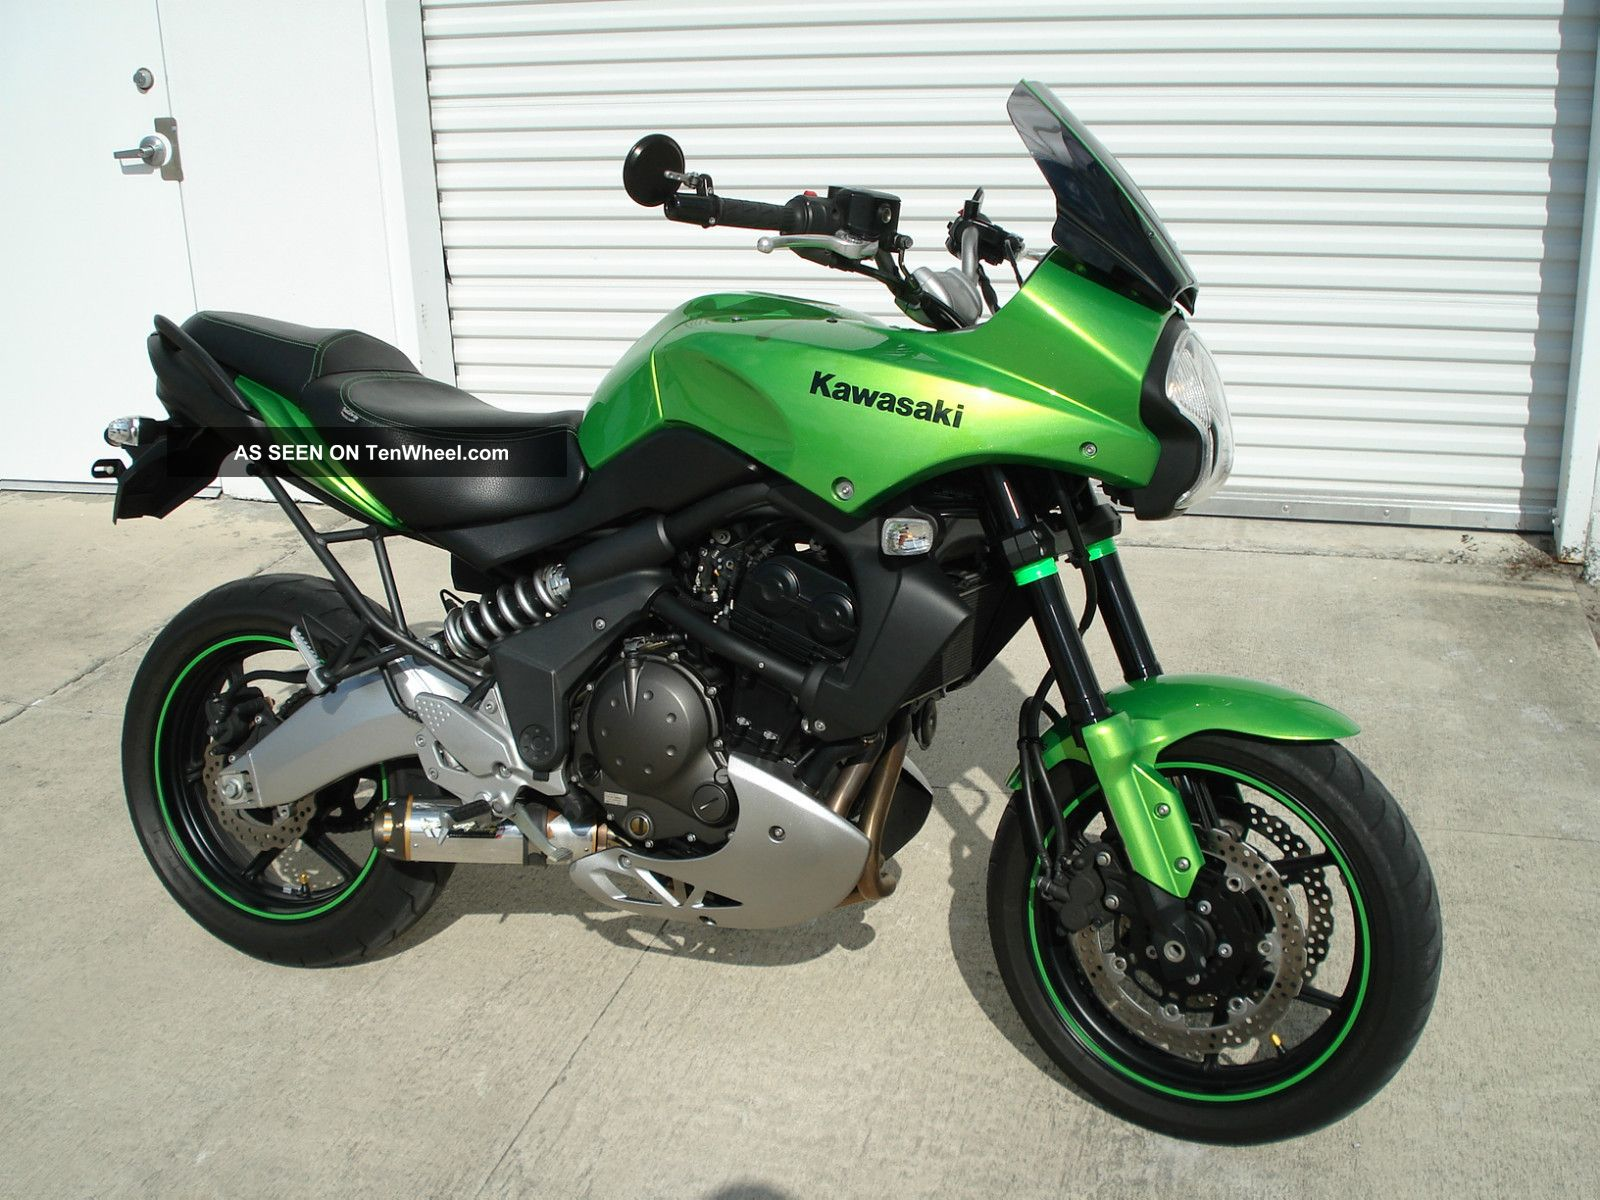 2009 Kawasaki Versys Immaculate Bike Extras Other photo